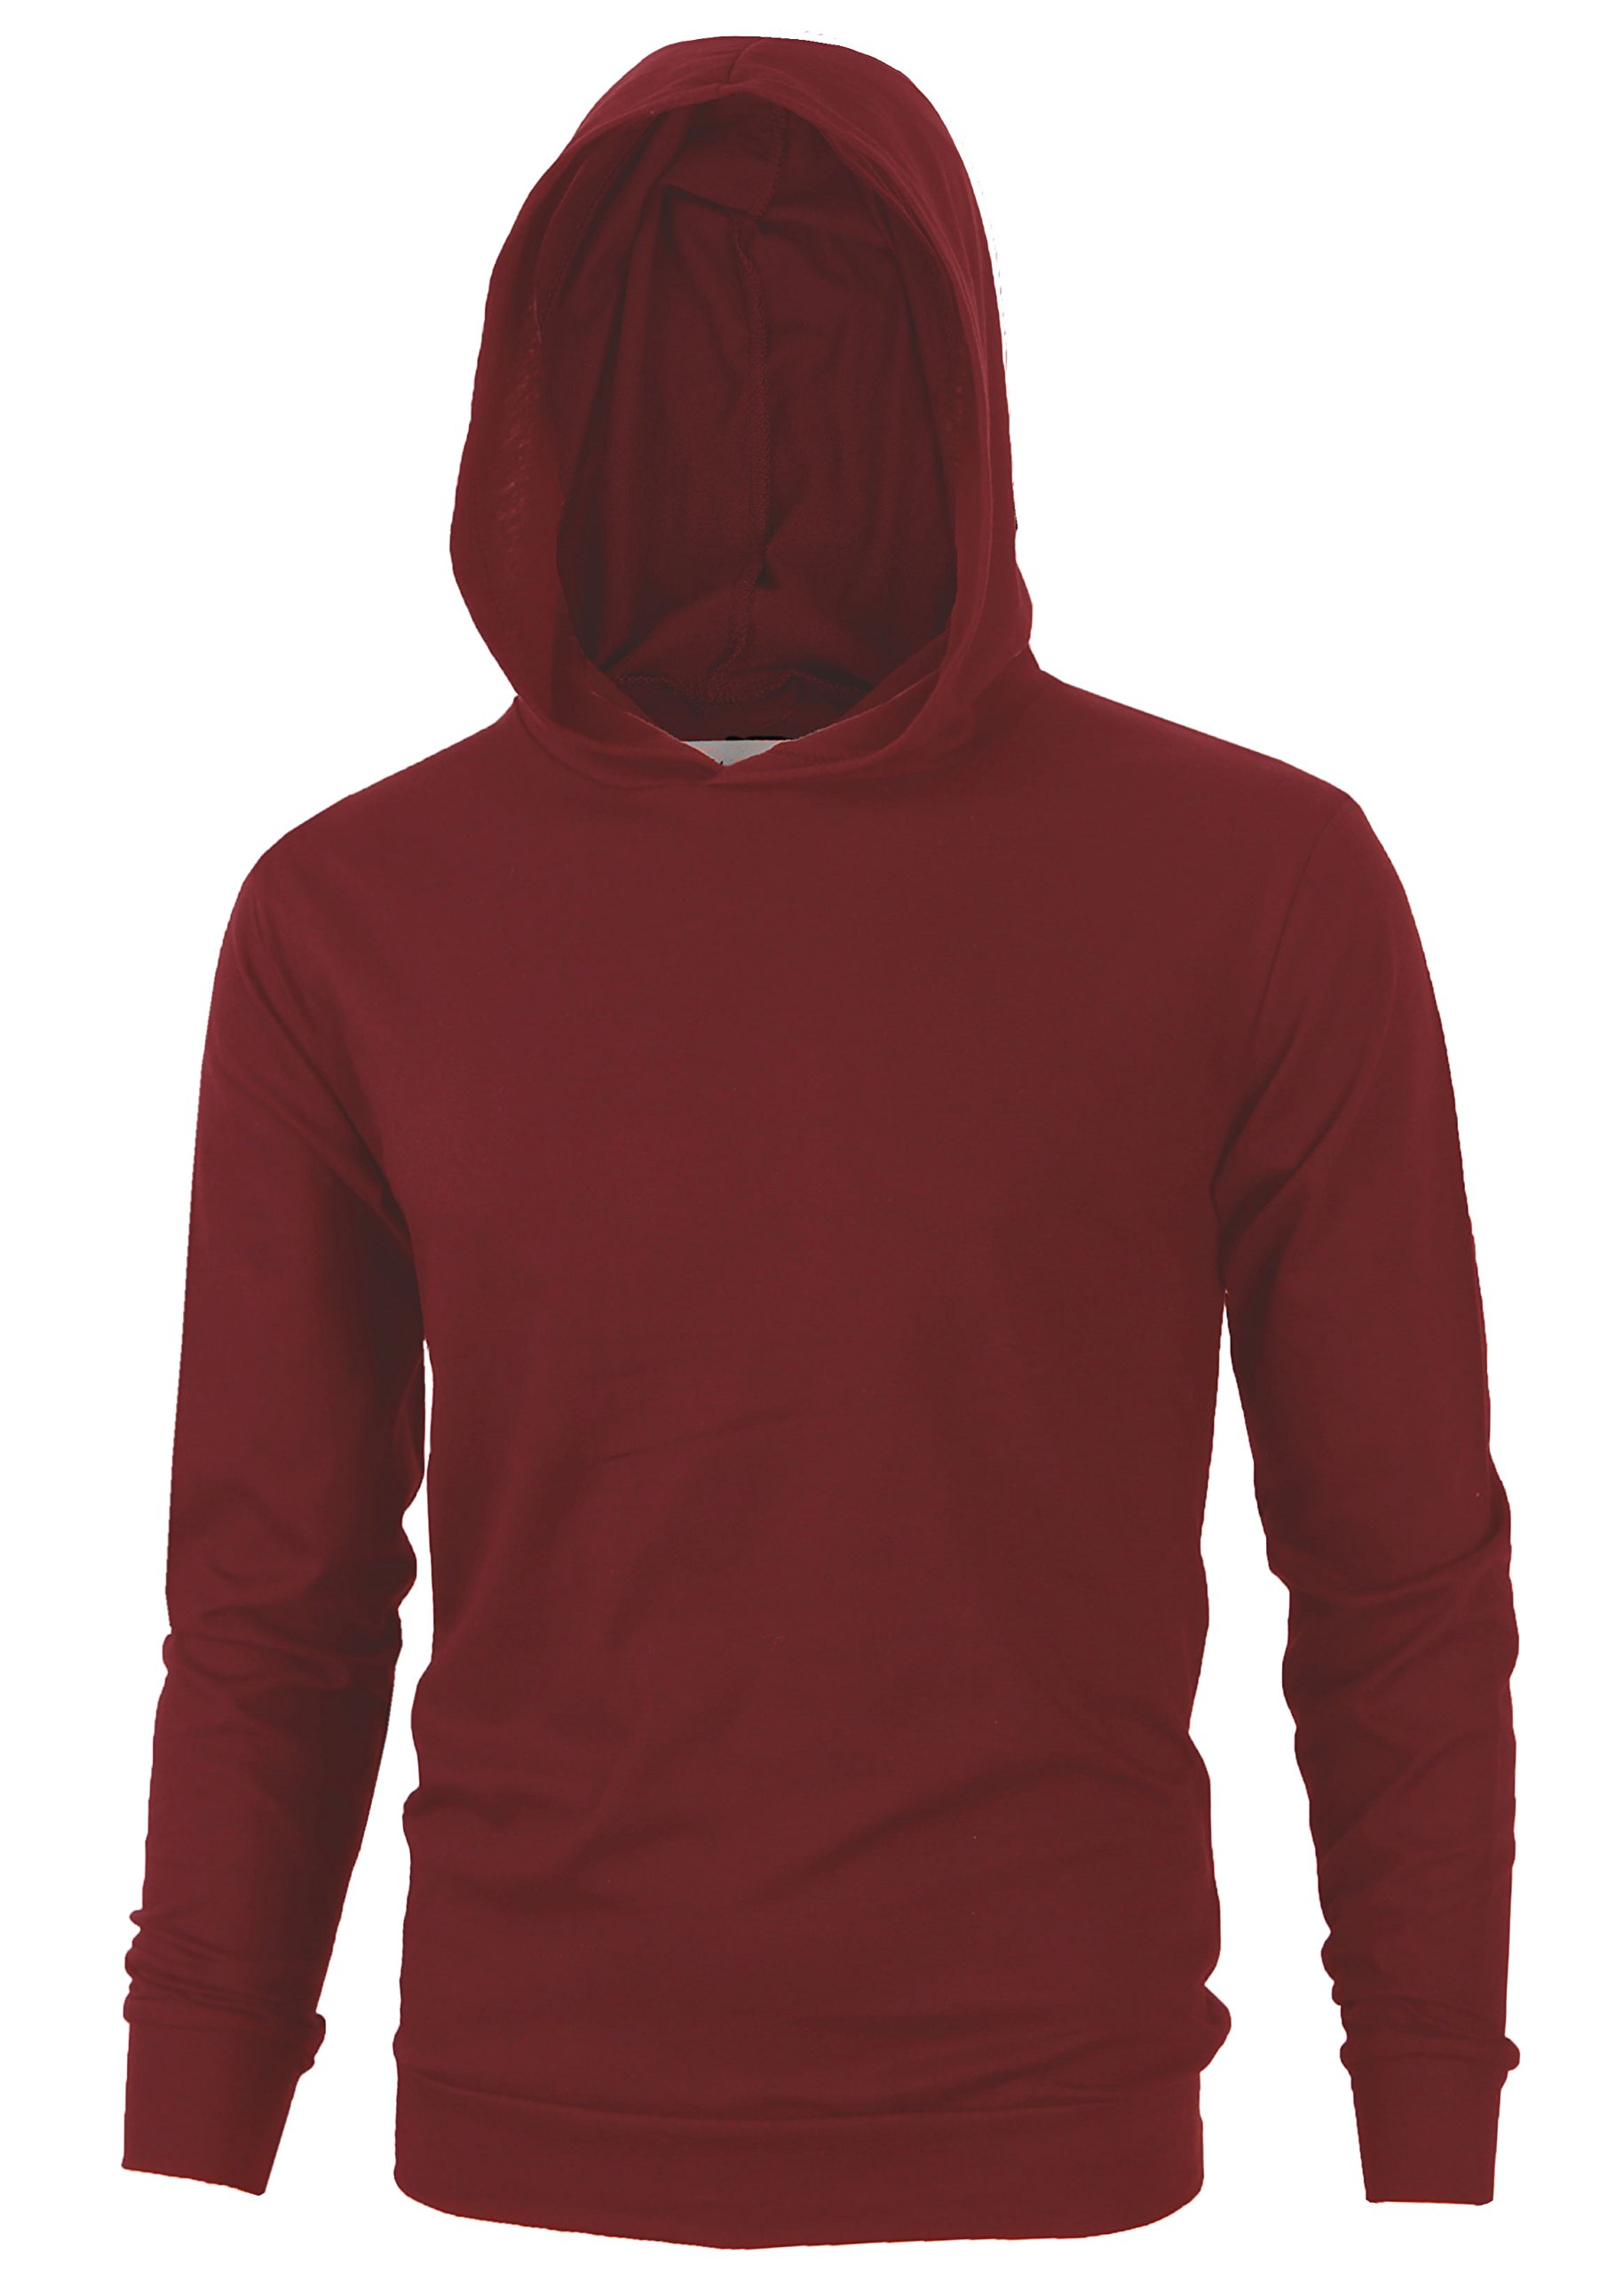 MAJECLO Mens Lightweight Cotton Pullover Long Sleeve Hoodie Sweatshirt(X-Large,Burgundy)